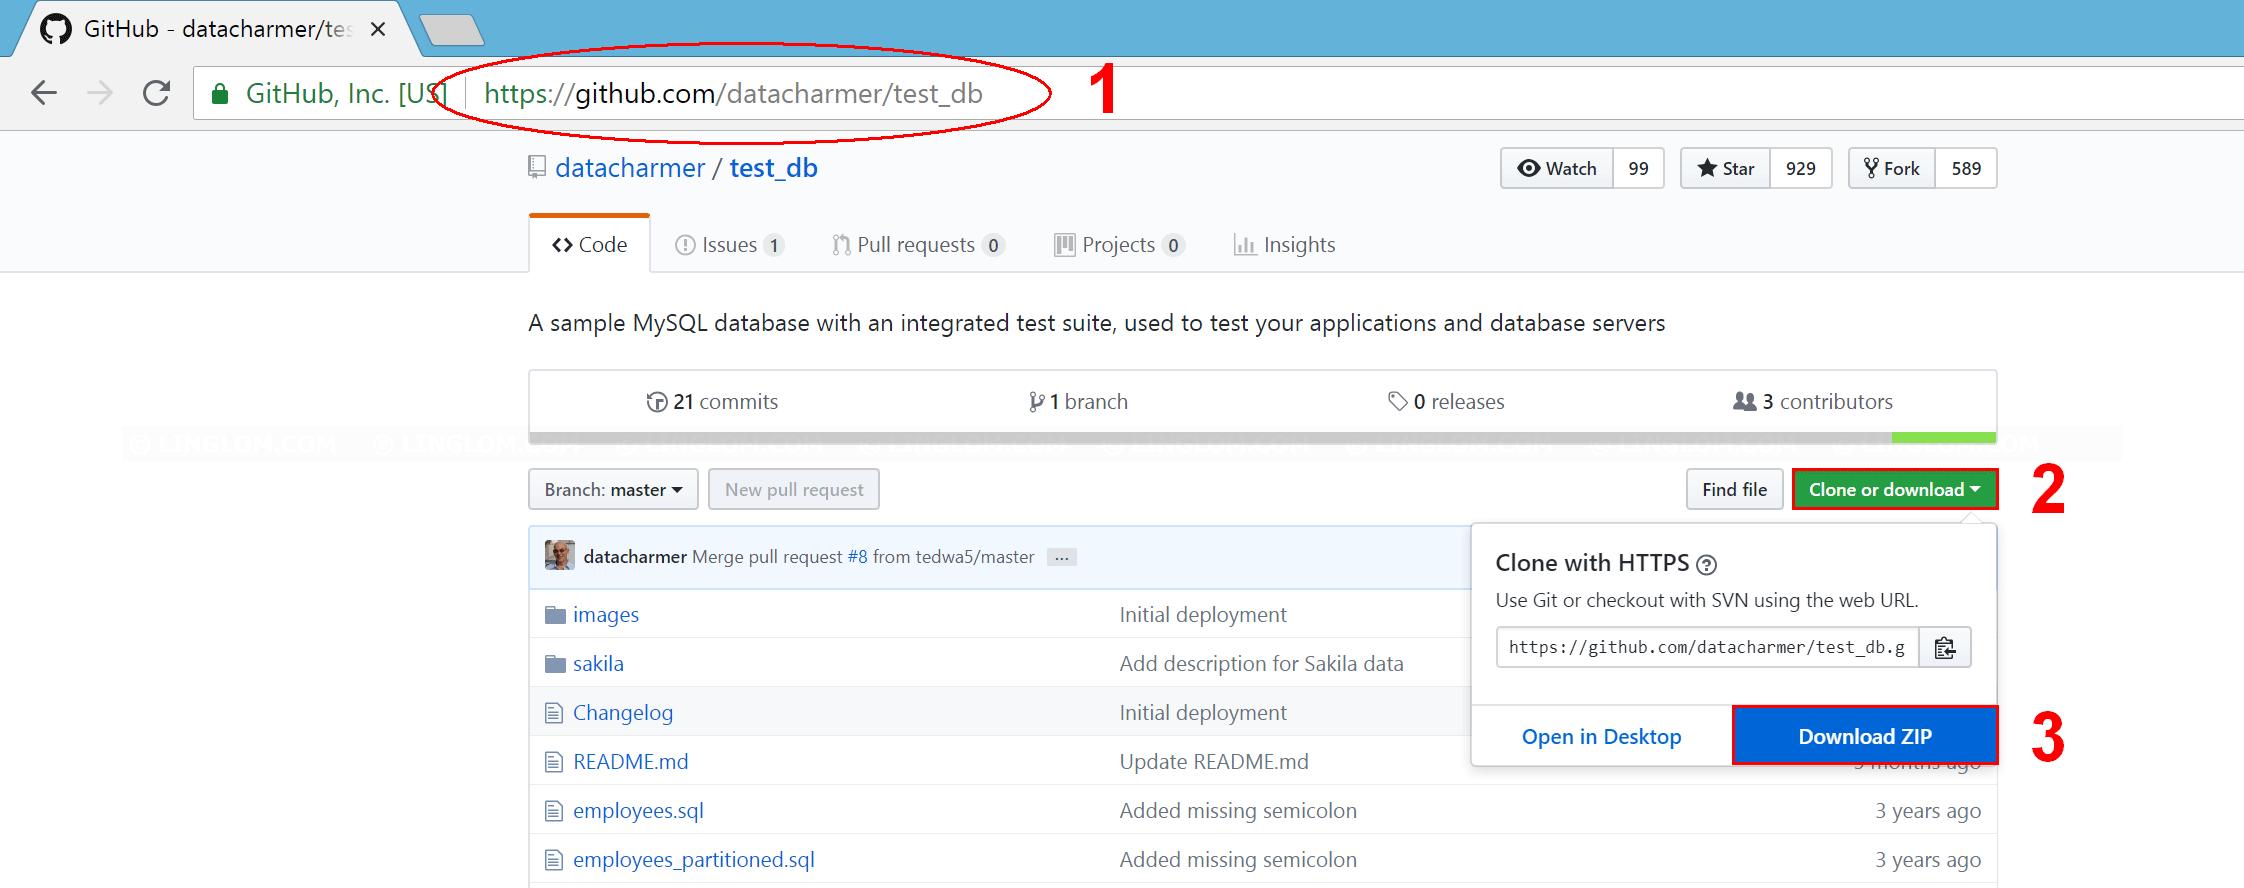 Accessing MariaDB on NetBeans 8 2 using JDBC, Part 1: Install